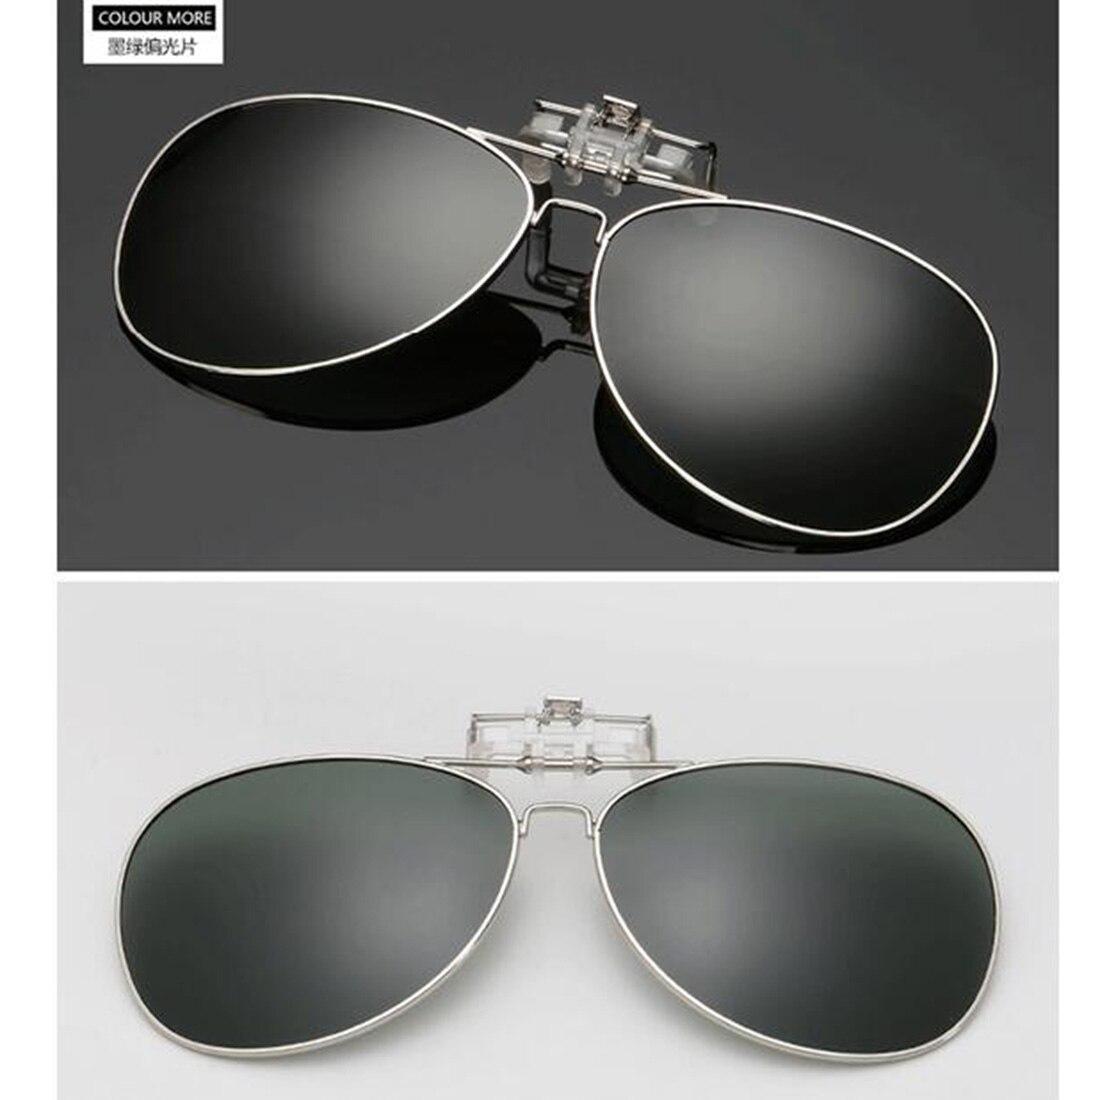 Clip On Sunglasses Polarized Polarised UV Driving Fishing Beach Boots Laser